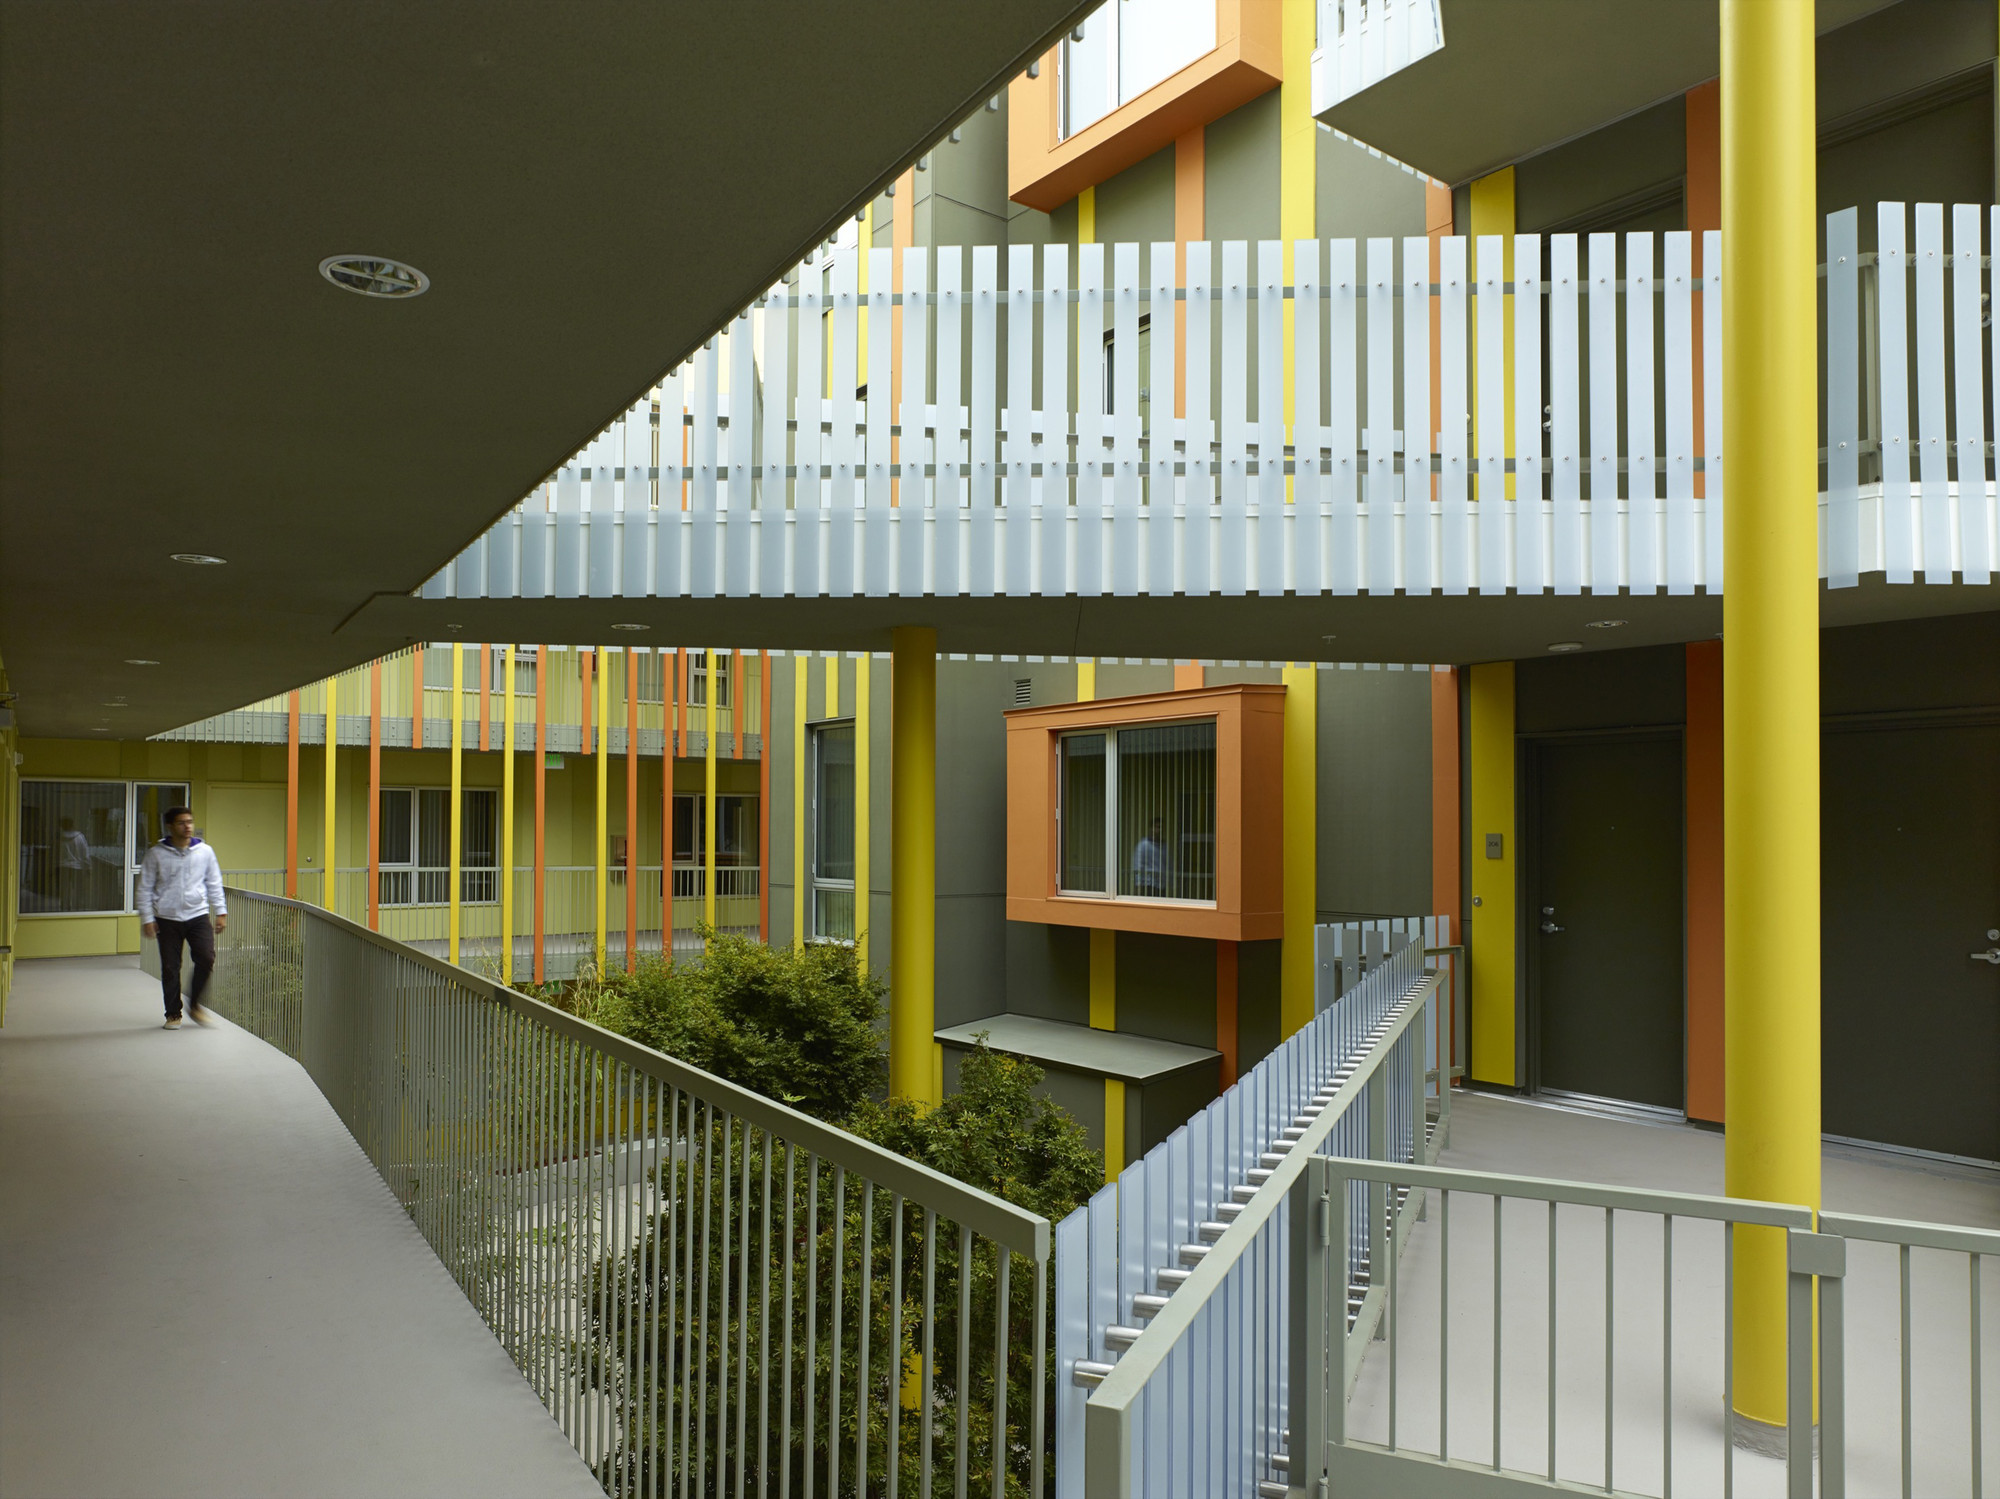 2802 Pico Housing / Moore Ruble Yudell, © John Linden